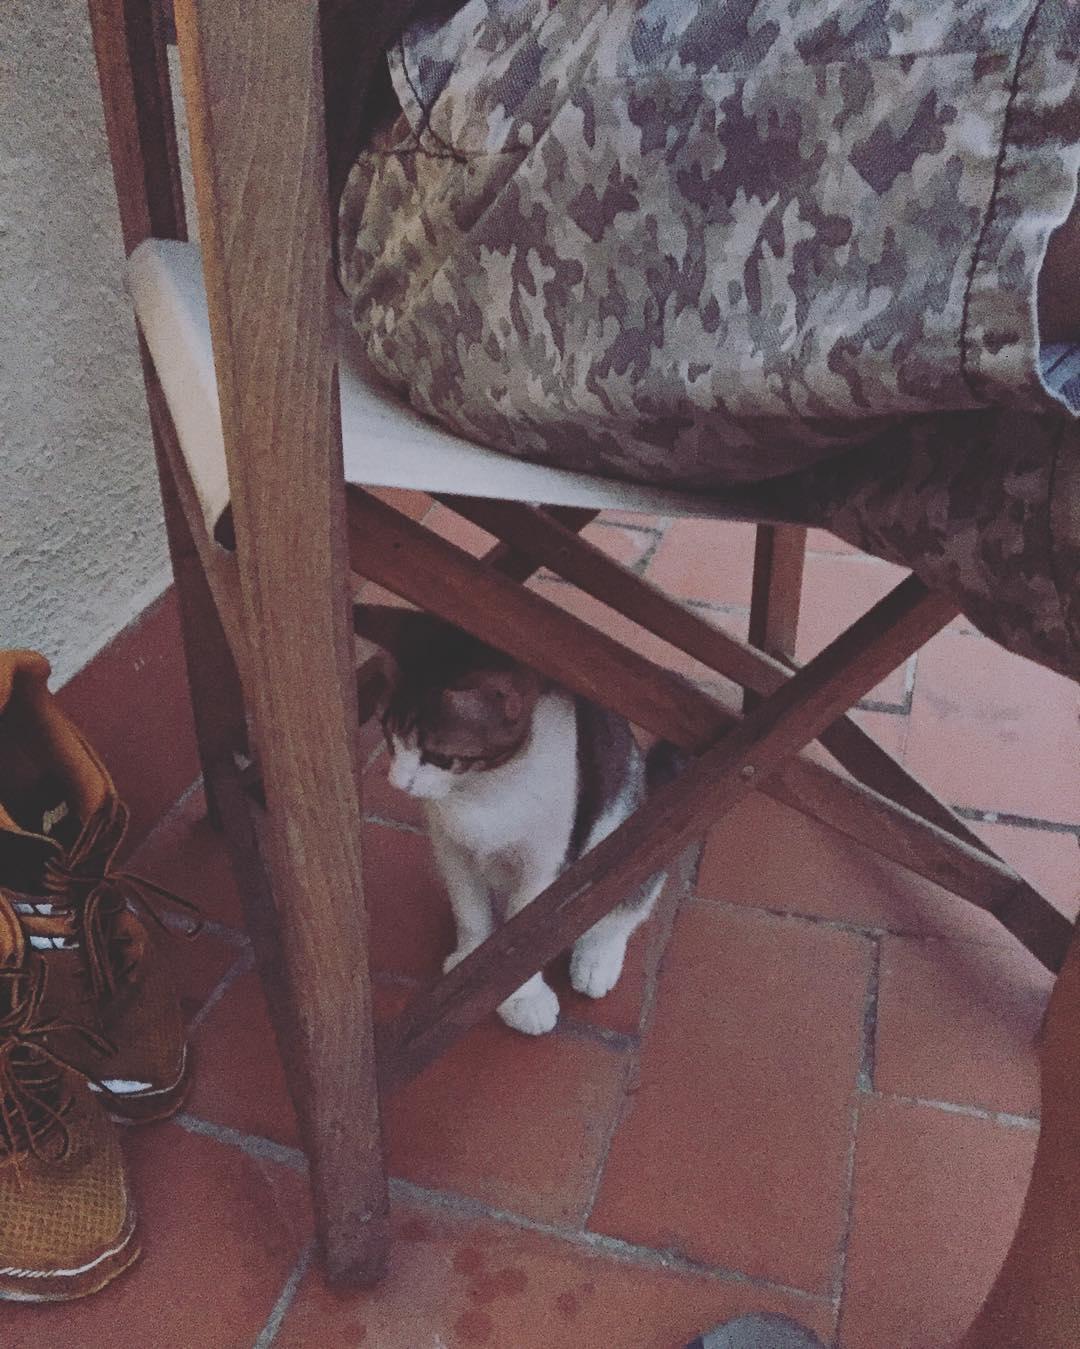 He visto un lindo gatito ;))